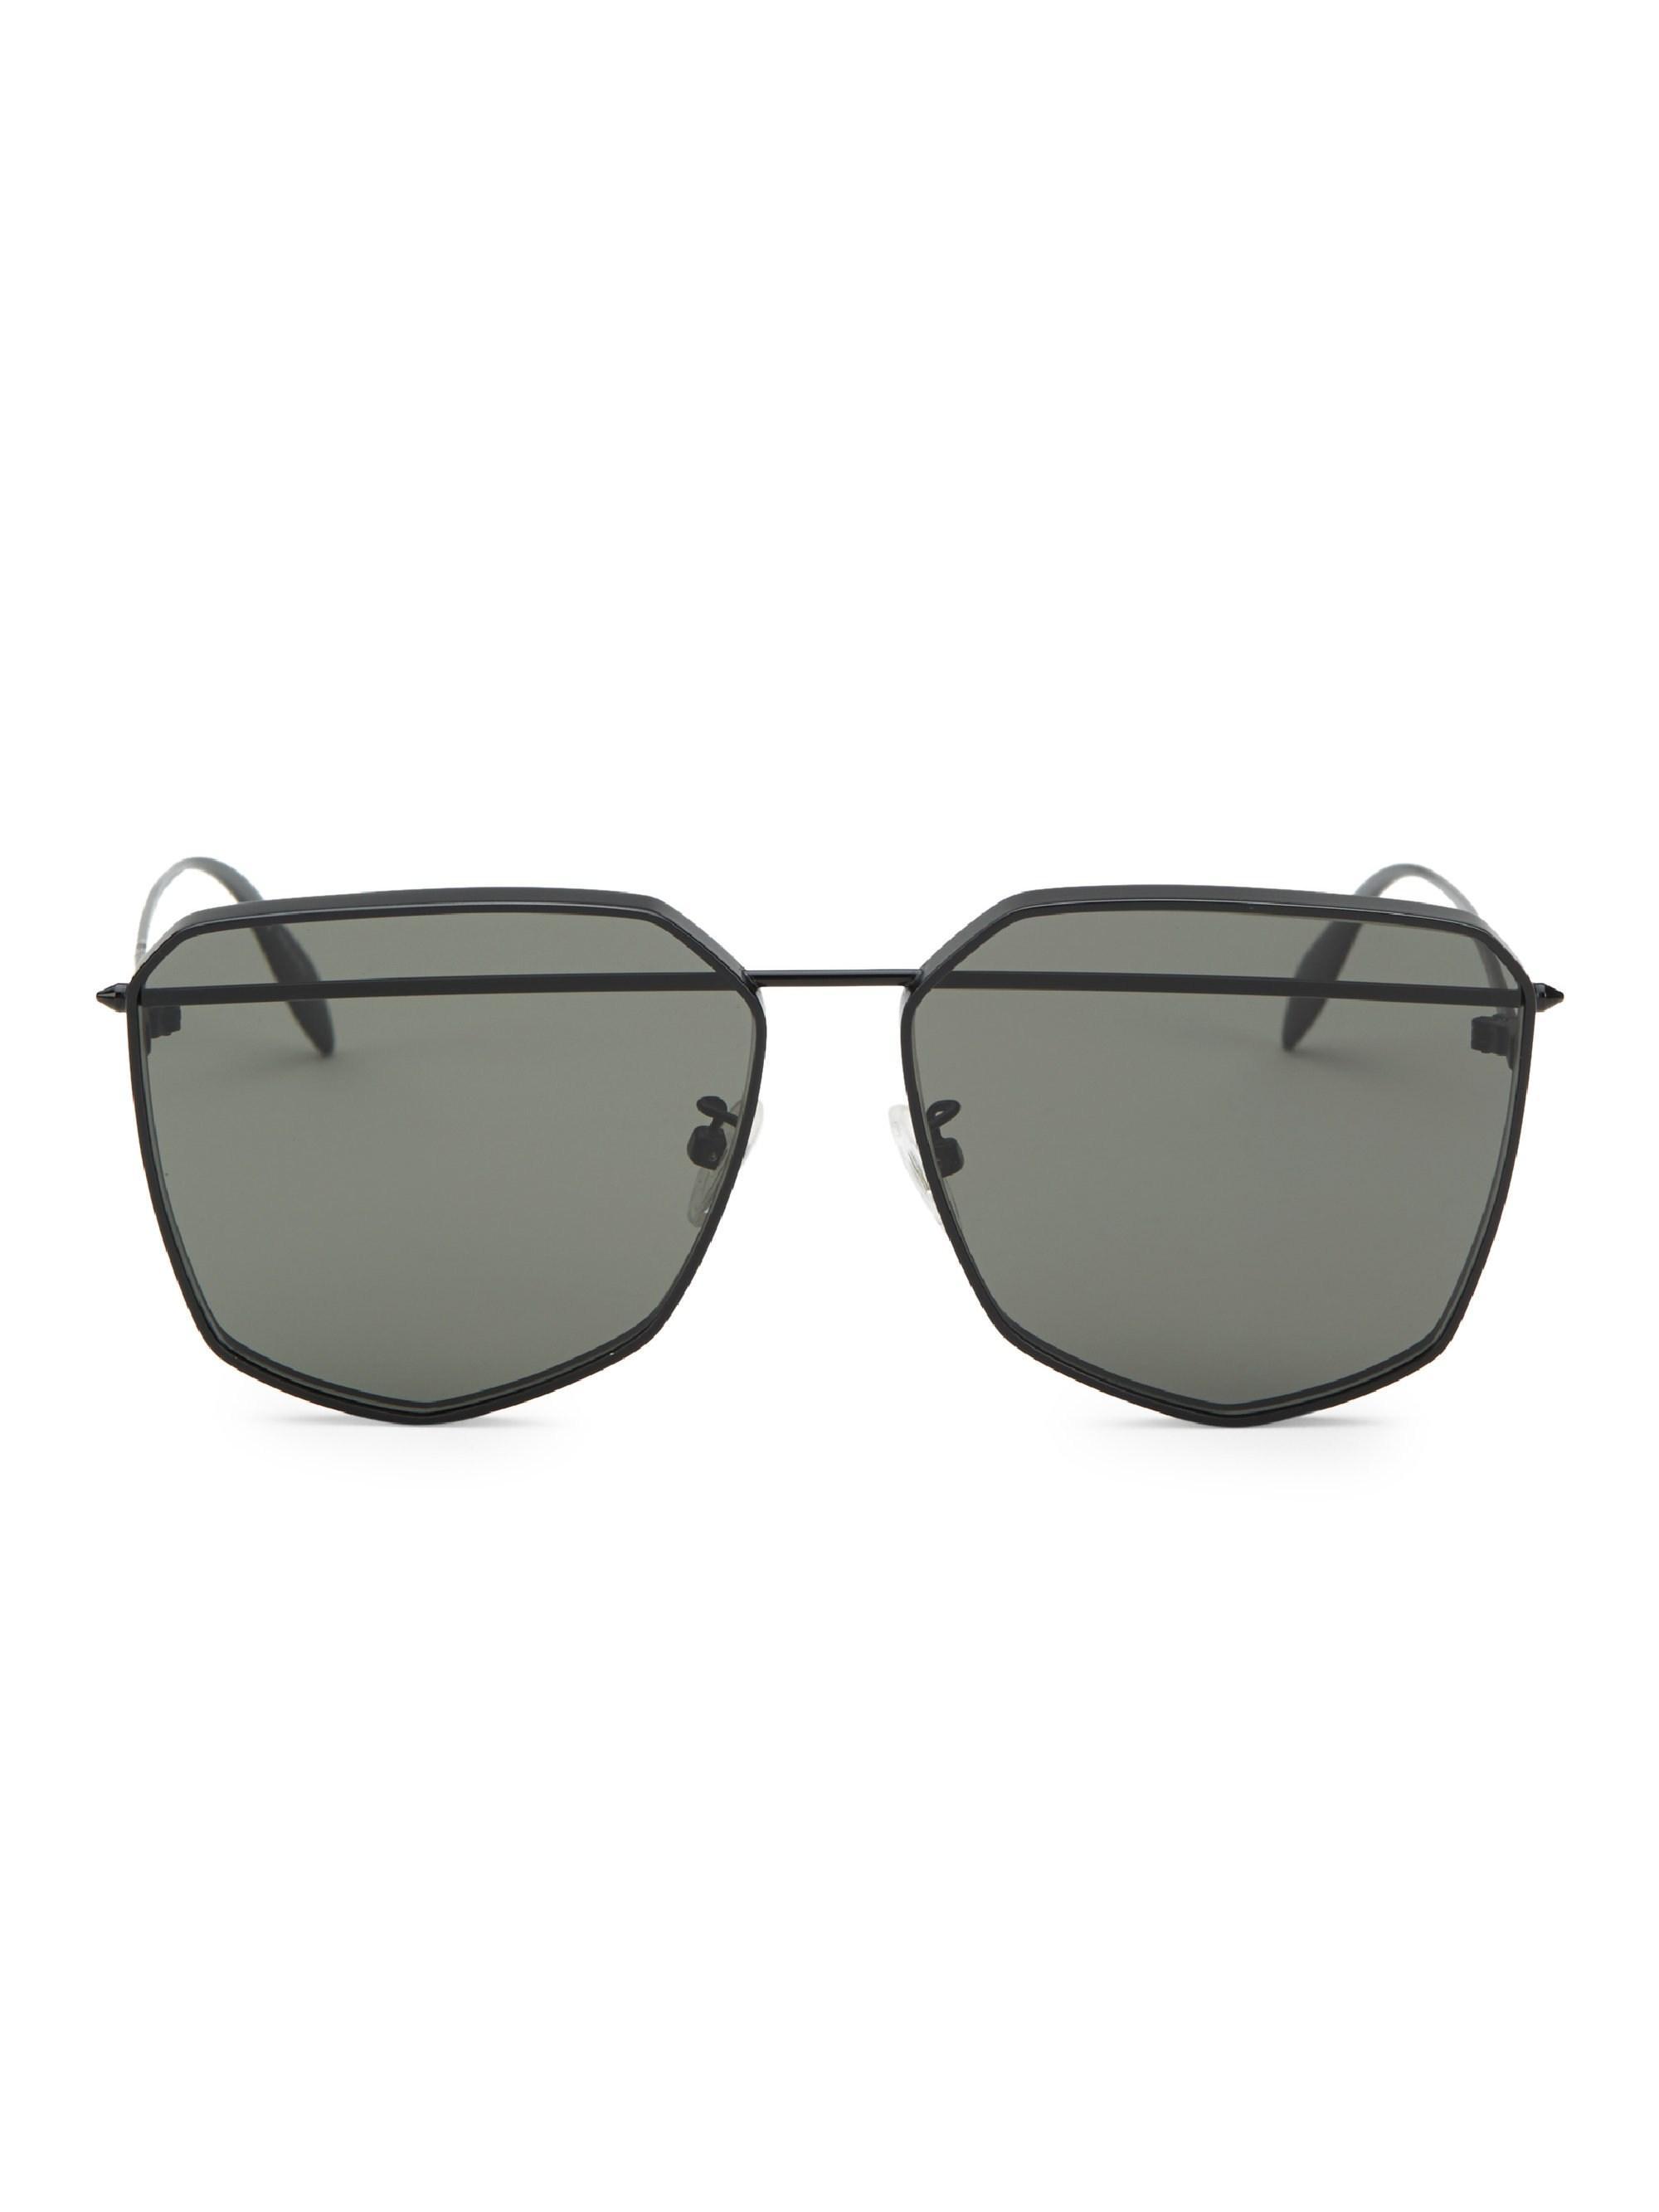 5f813721a85a Lyst - Alexander McQueen Men s 61mm Black Geometric Sunglasses ...